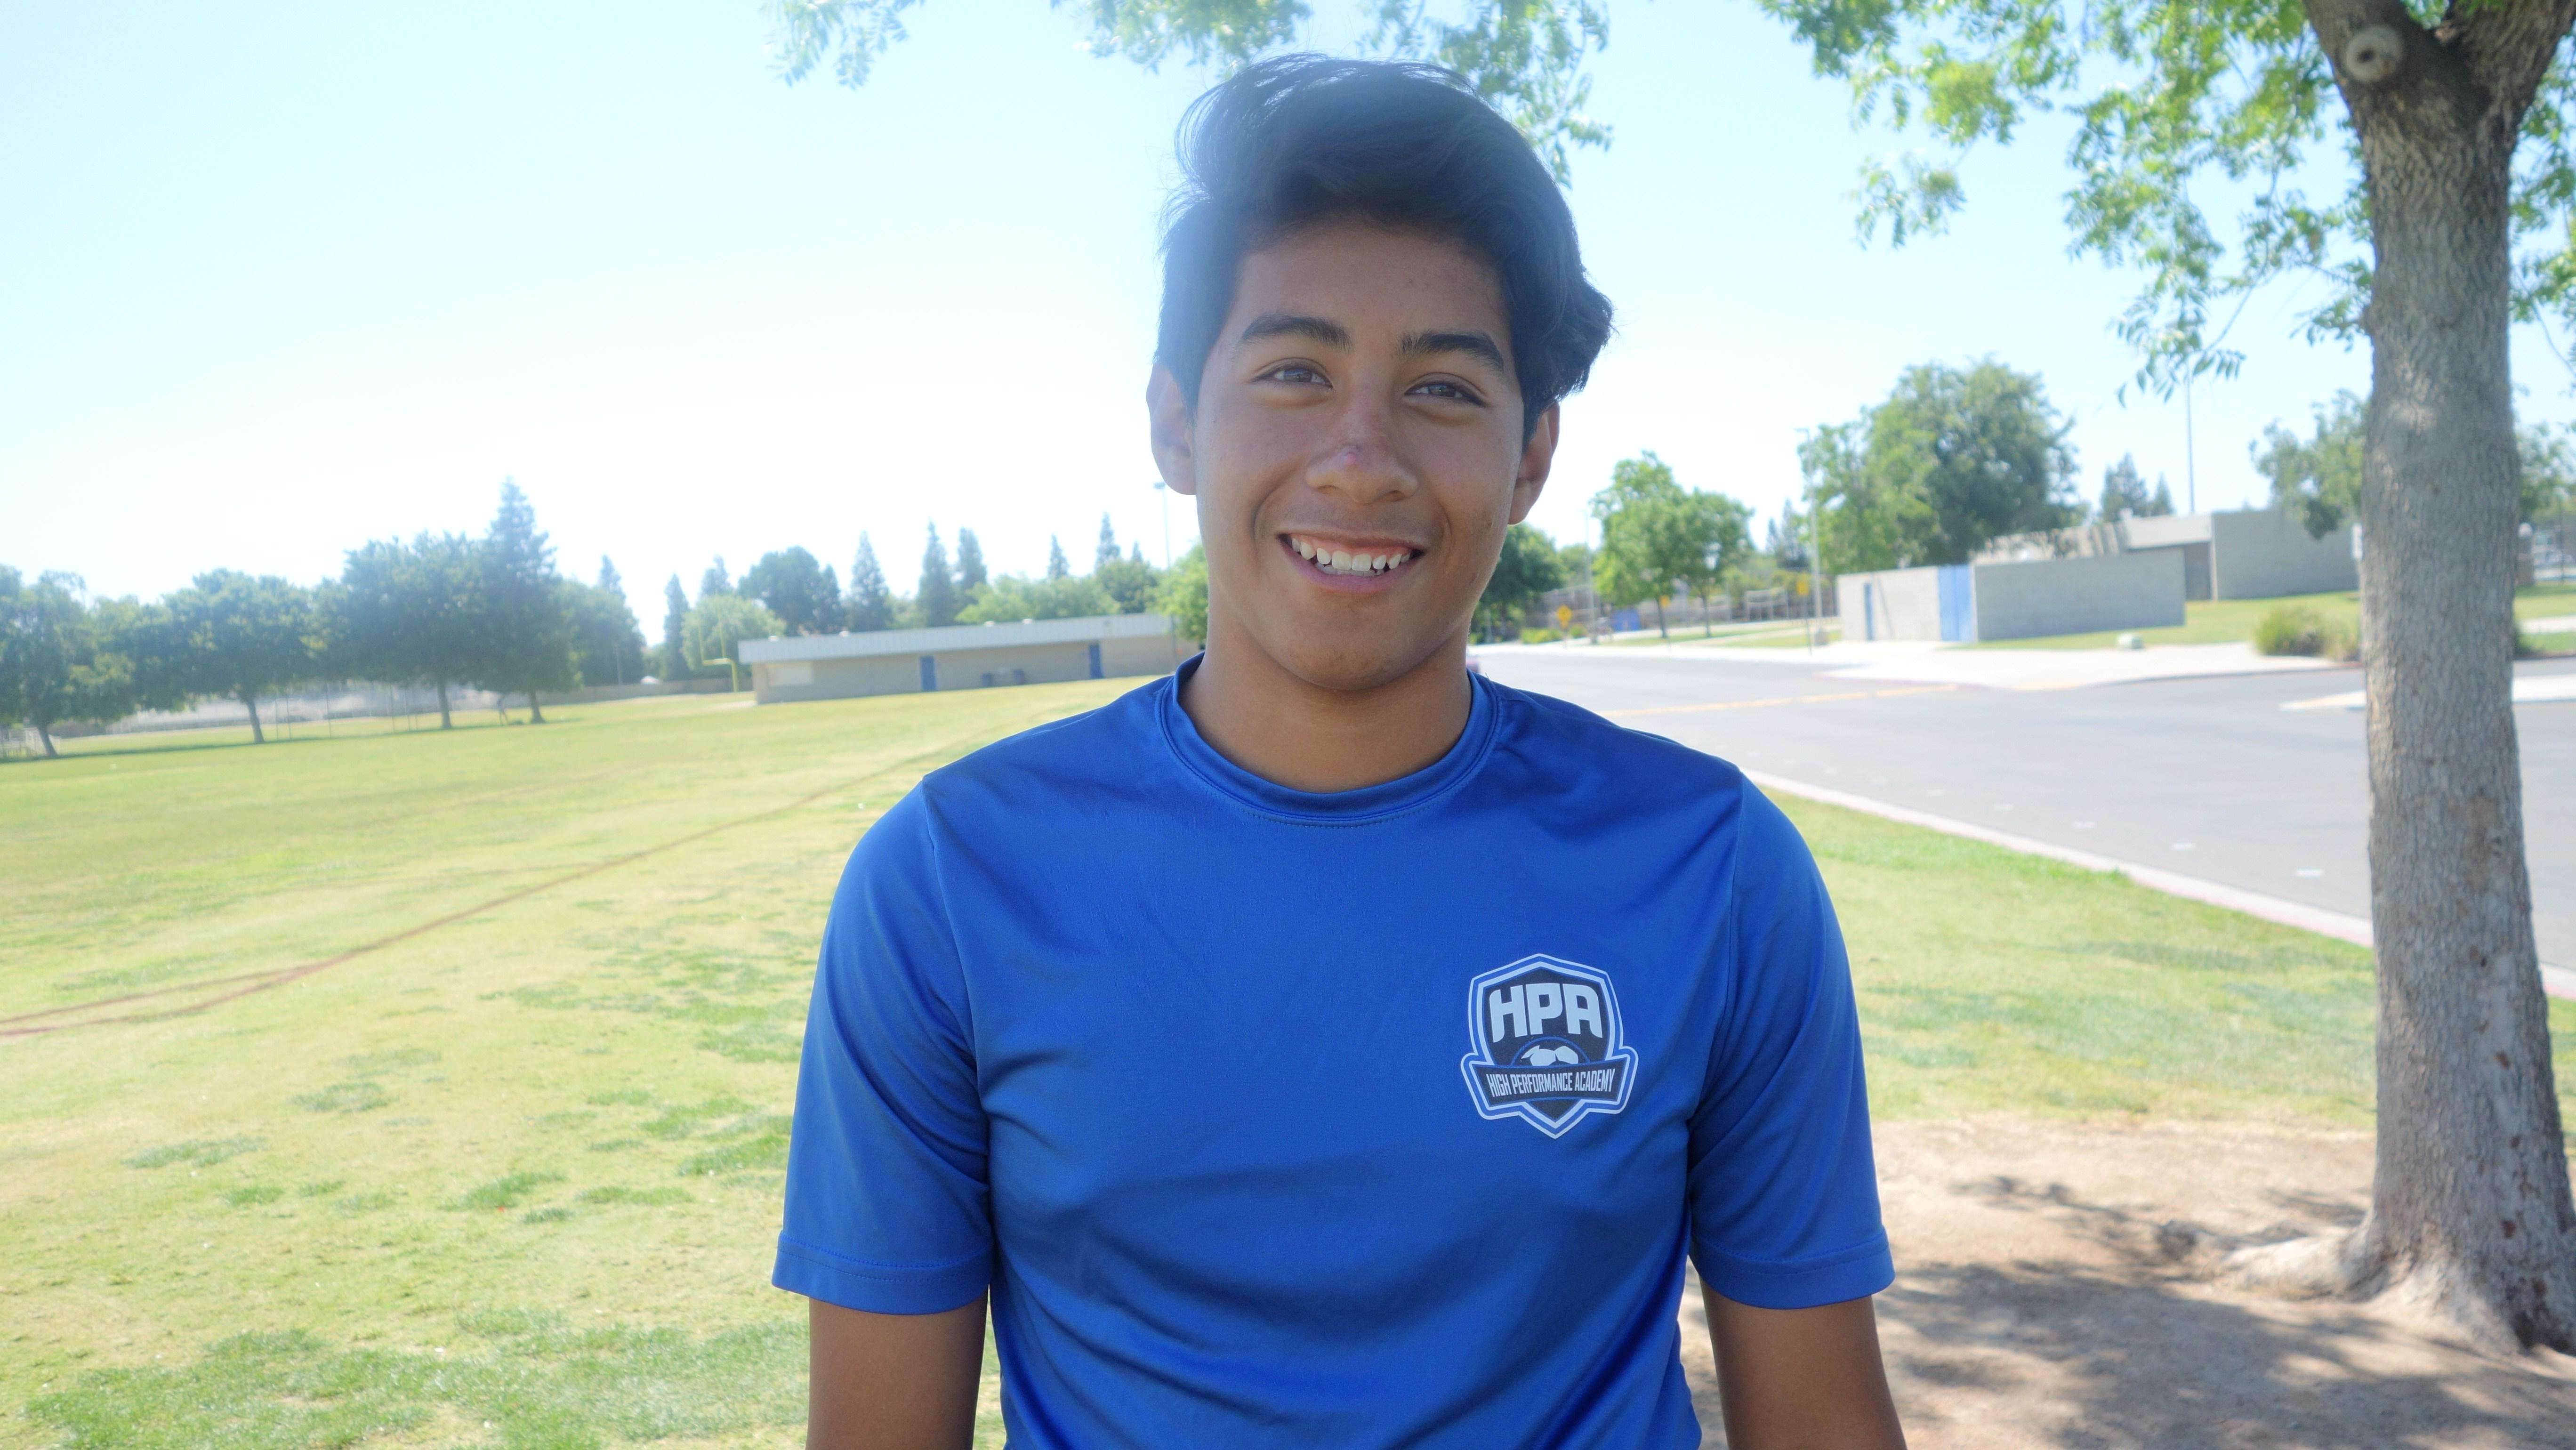 Julian Garcia helps win the Manteca Invitational Tournament! - HPA Nation